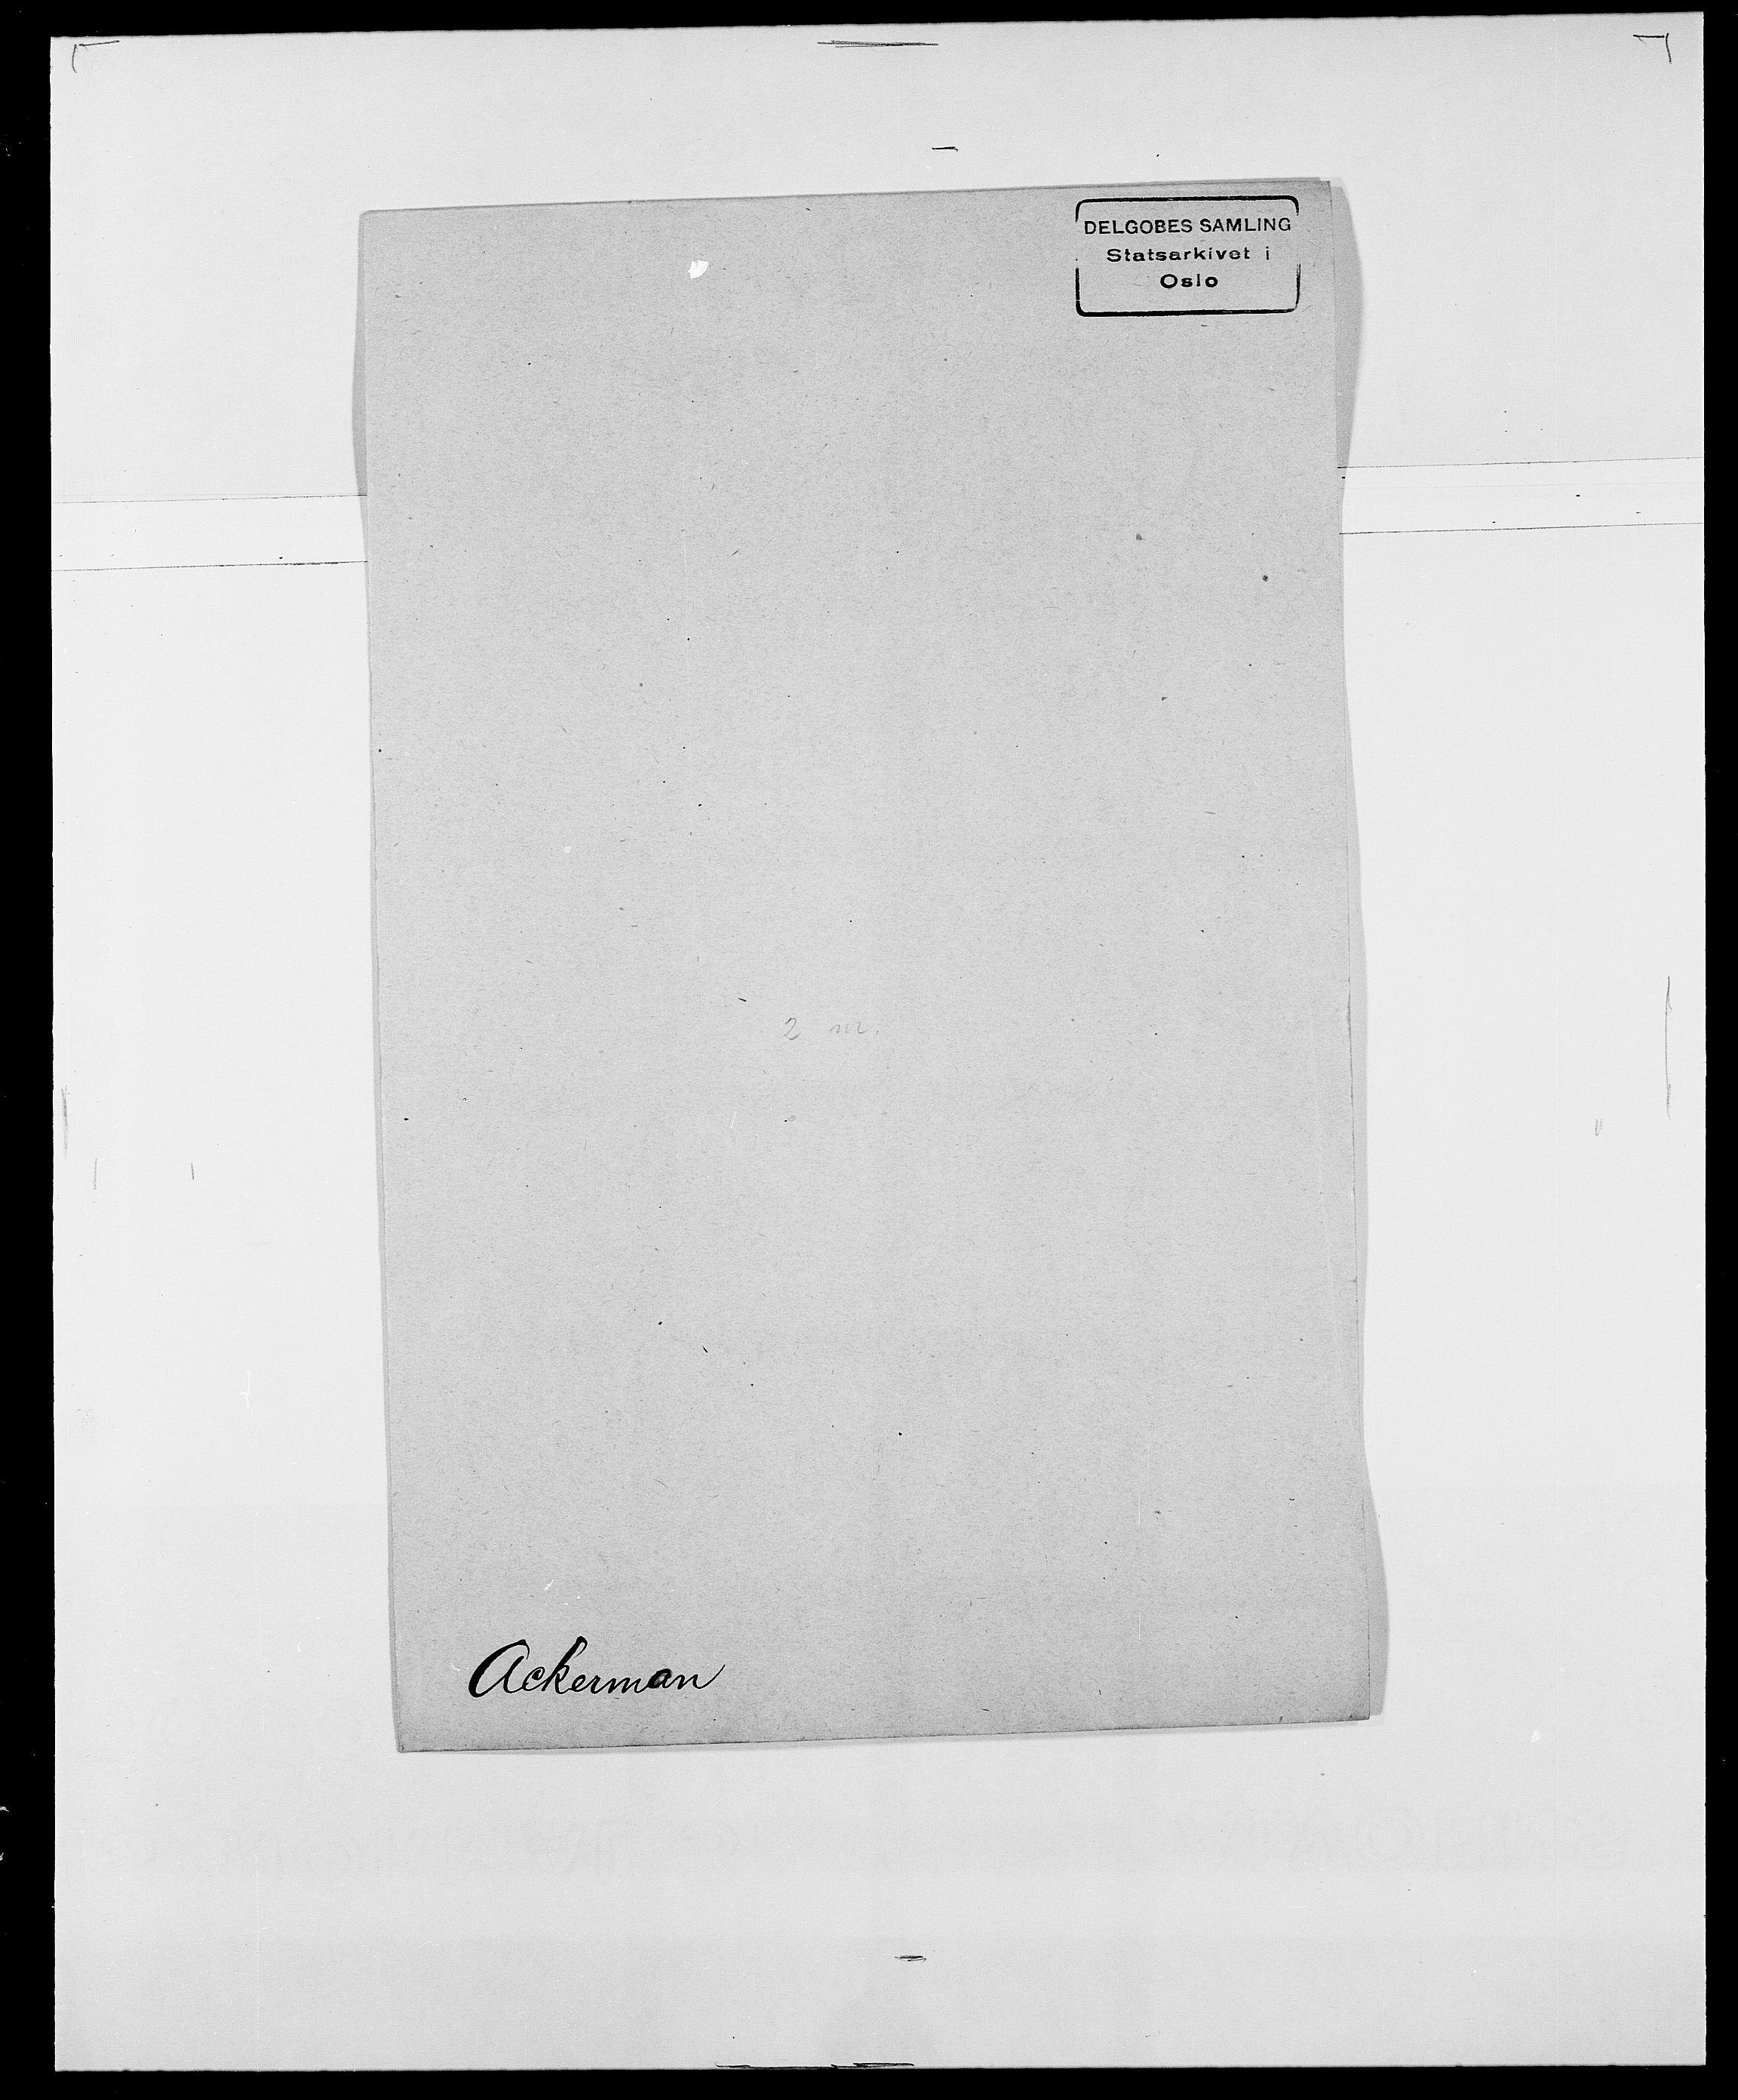 SAO, Delgobe, Charles Antoine - samling, D/Da/L0001: Aabye - Angerman, s. 241